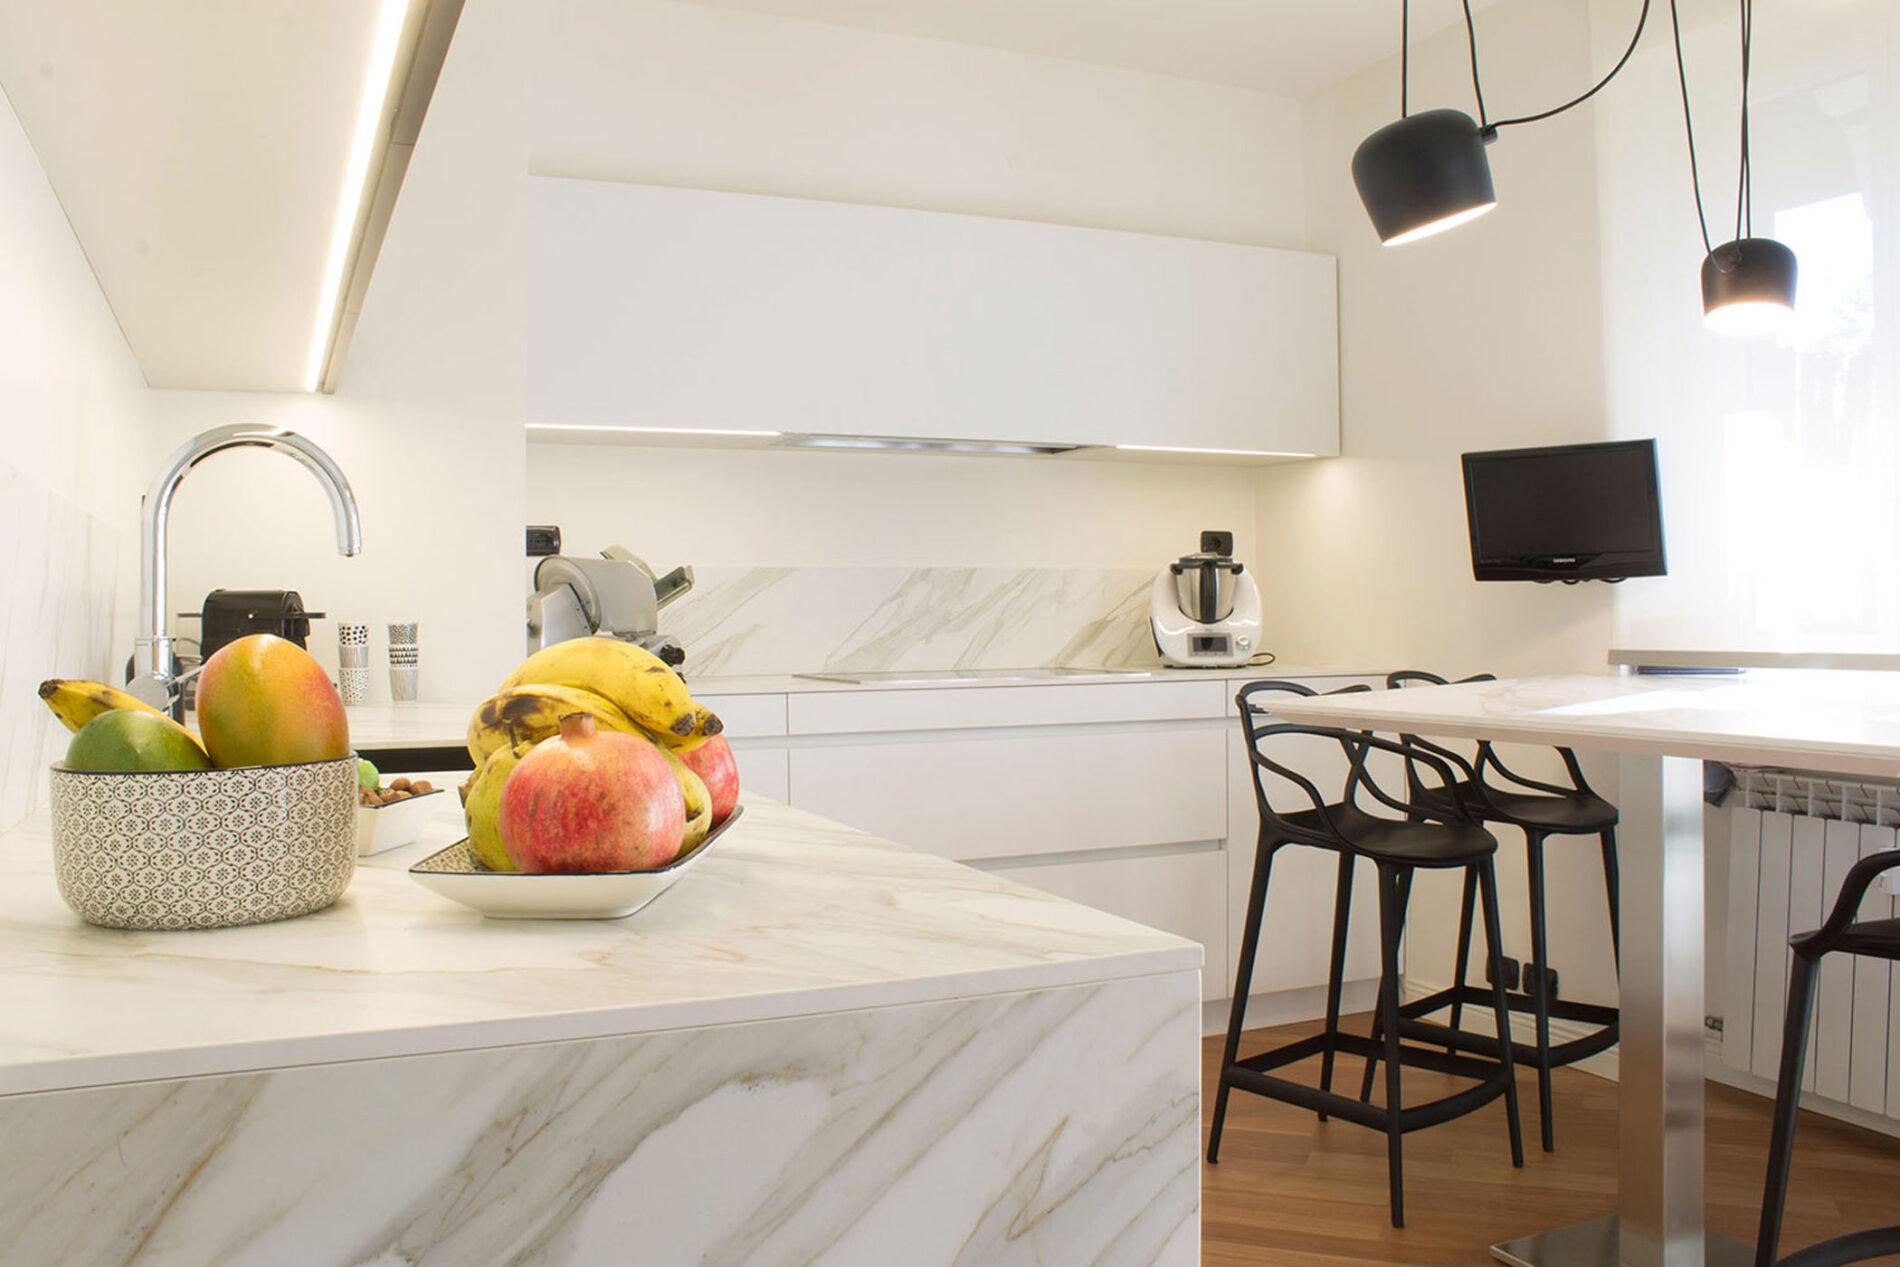 Cucina B2 Tosi Gorletta 5 - Progetti